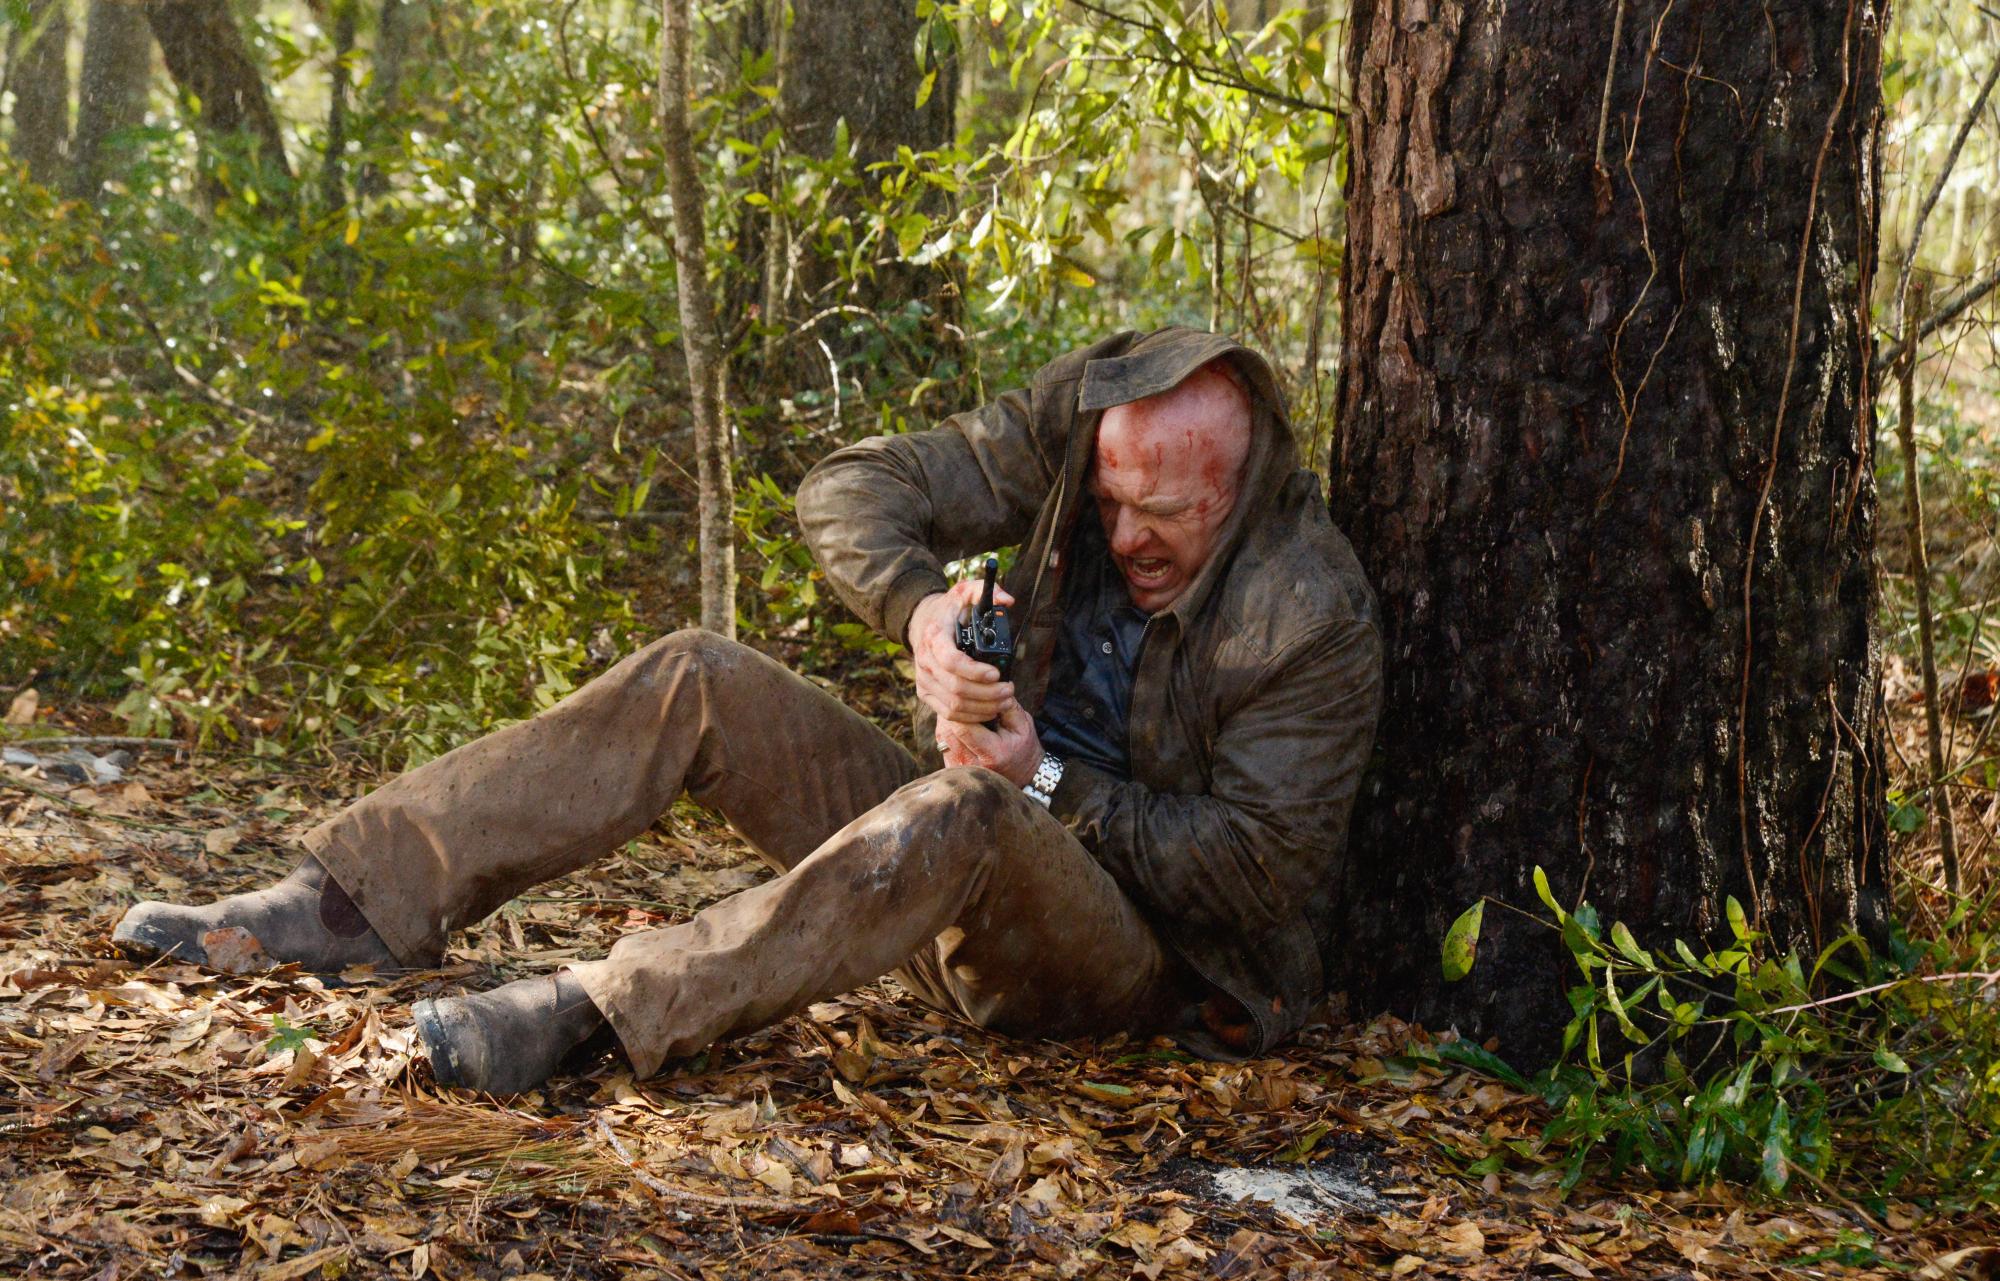 Season 2 Episode 3 - Under The Dome - CBS.com